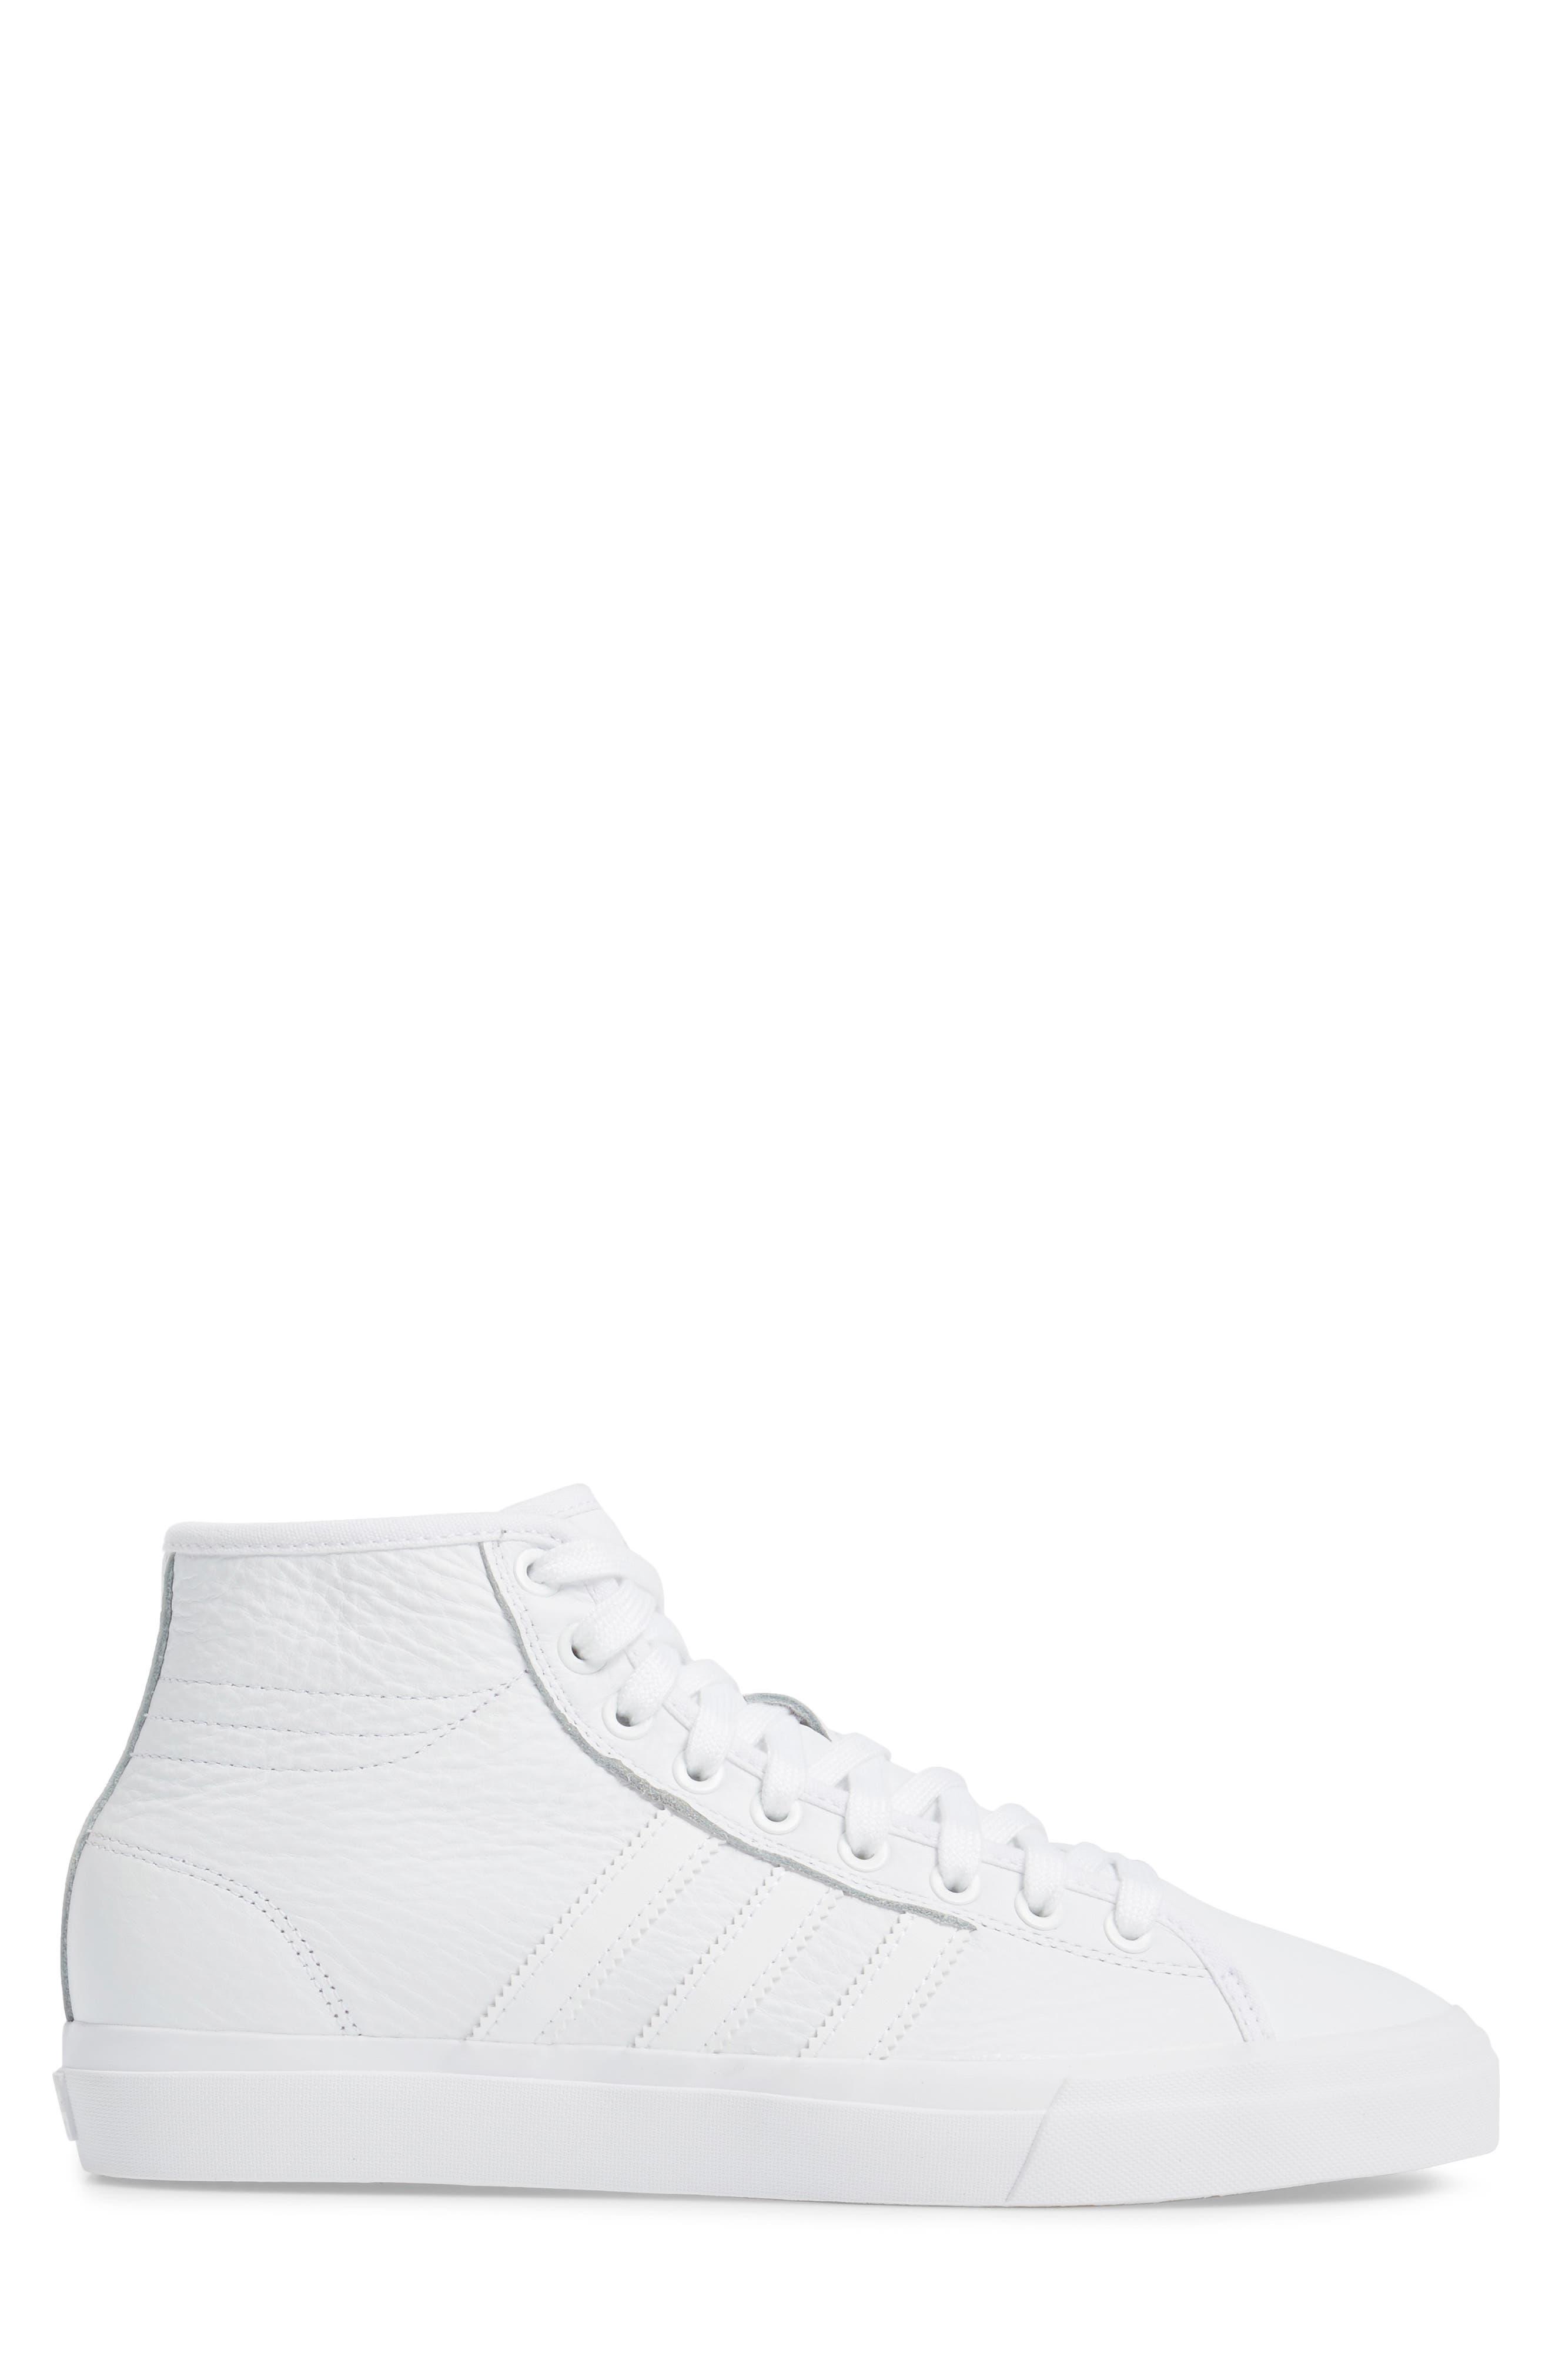 Matchcourt High Top Sneaker,                             Alternate thumbnail 3, color,                             White/ White/ White